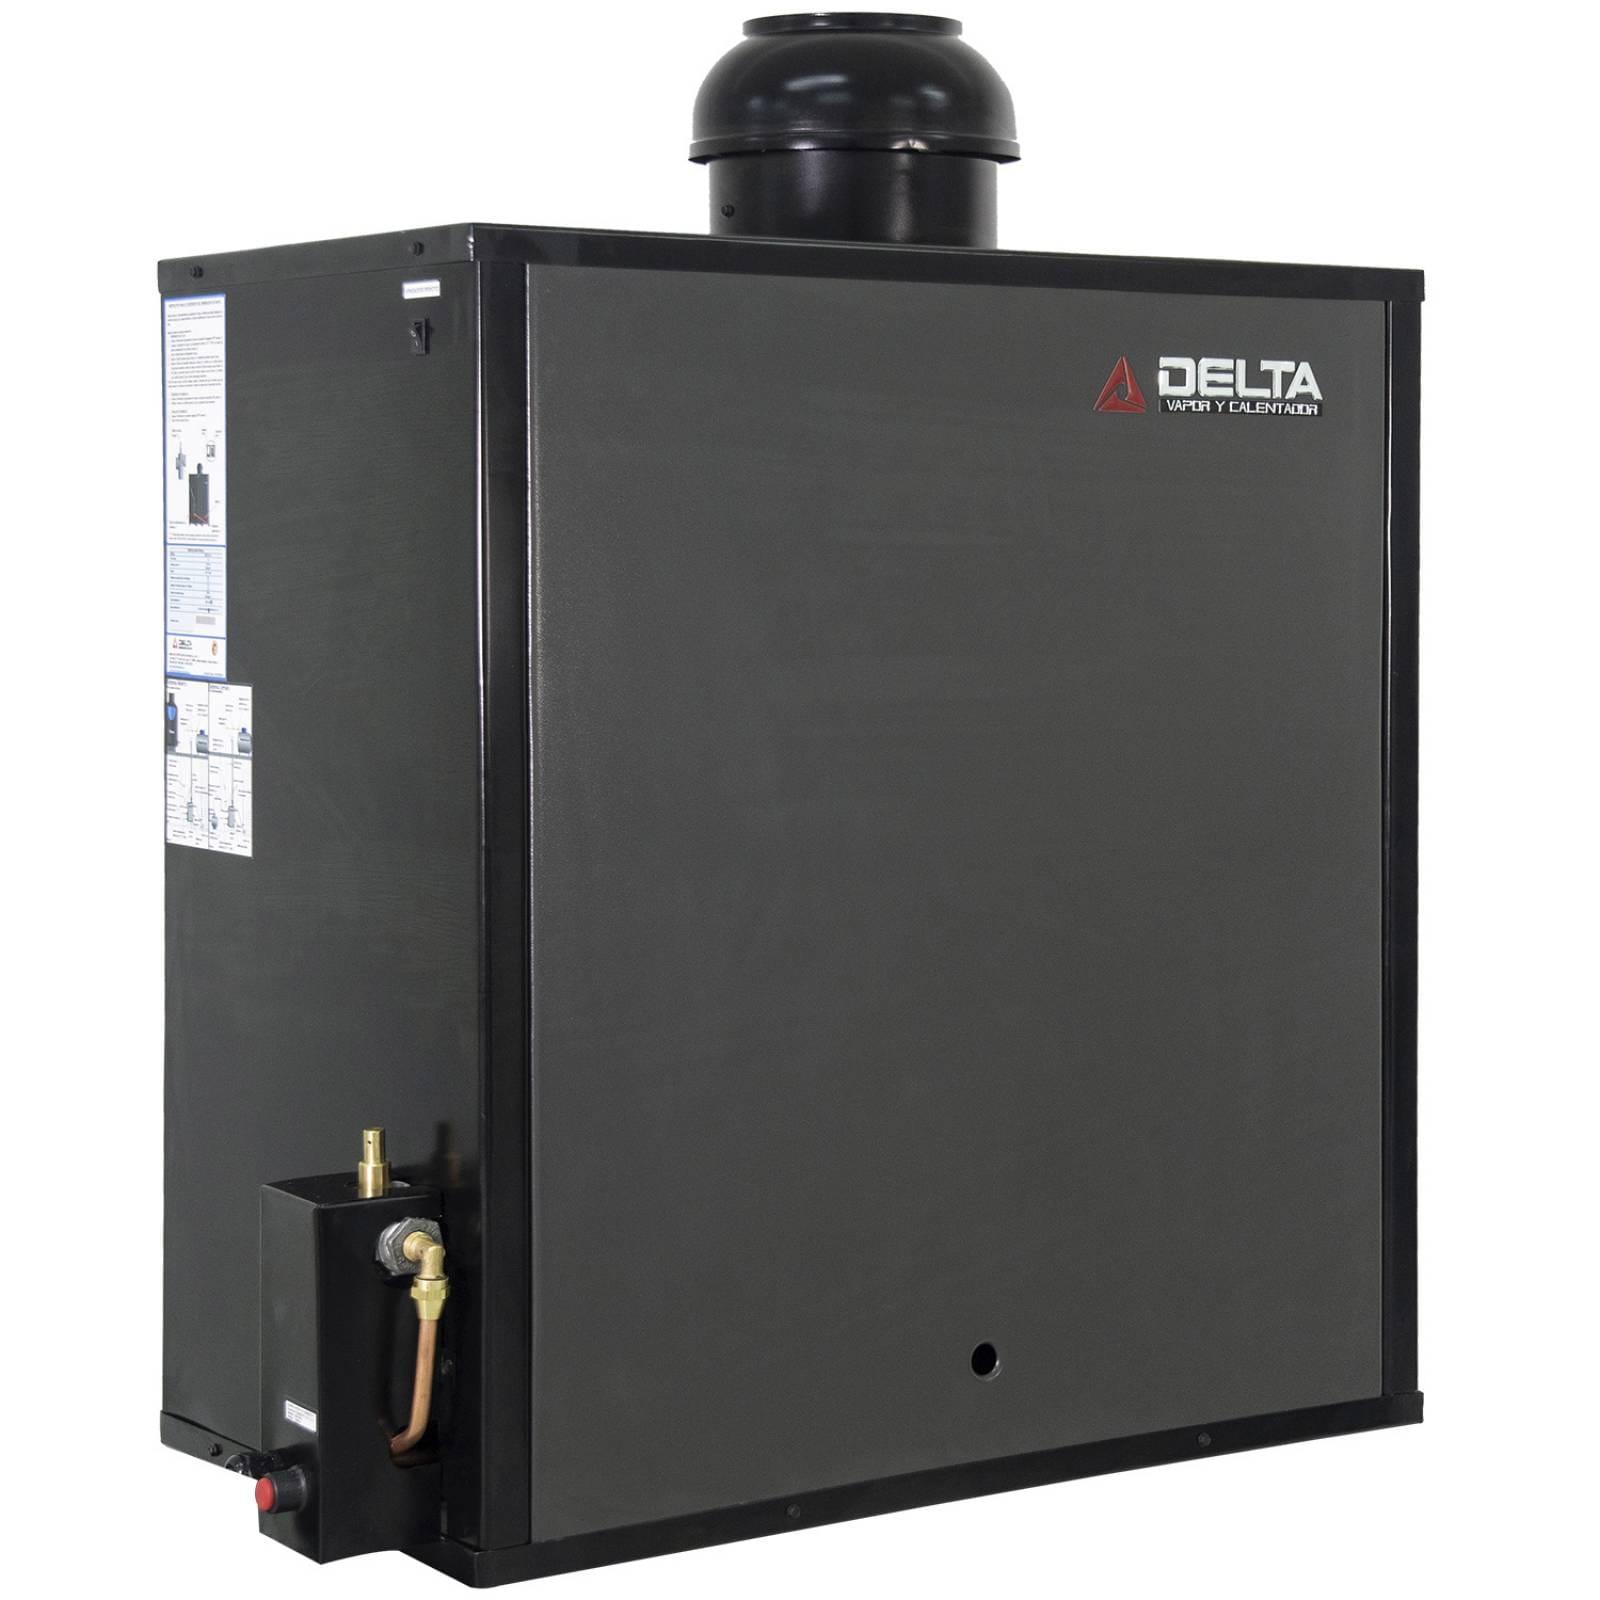 Generador de Vapor Diseñado para Hogar o Spa Instalación en Espacios de 30 m. Cúbicos Gas Natural Delta